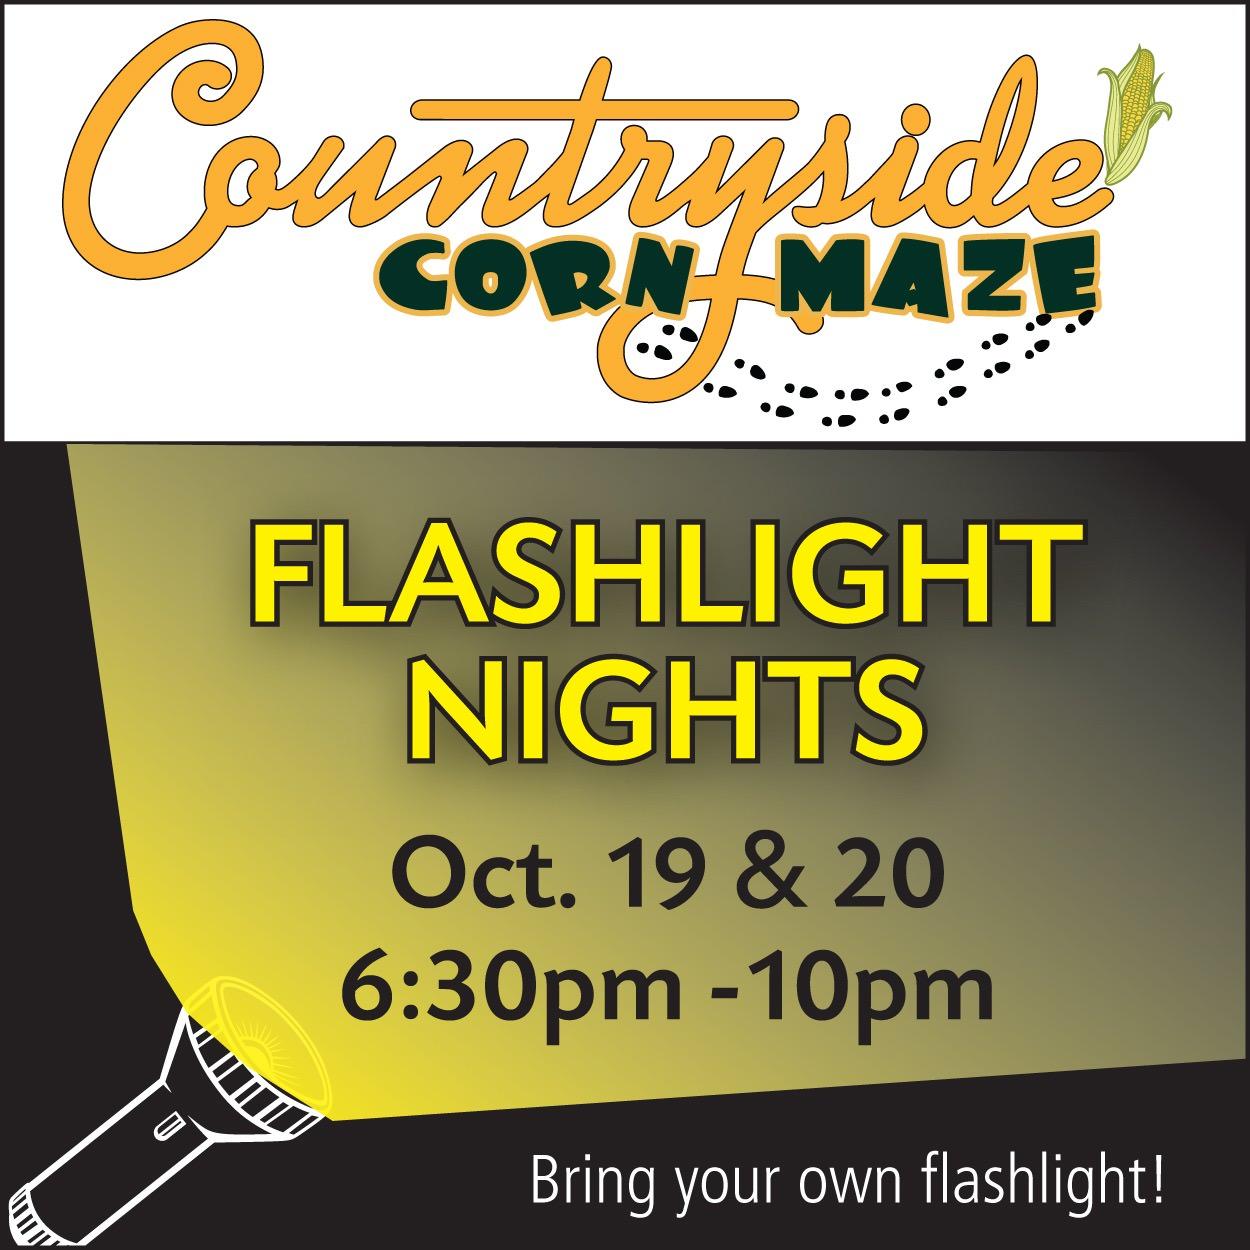 Flashlight Nights at Countryside Citrus